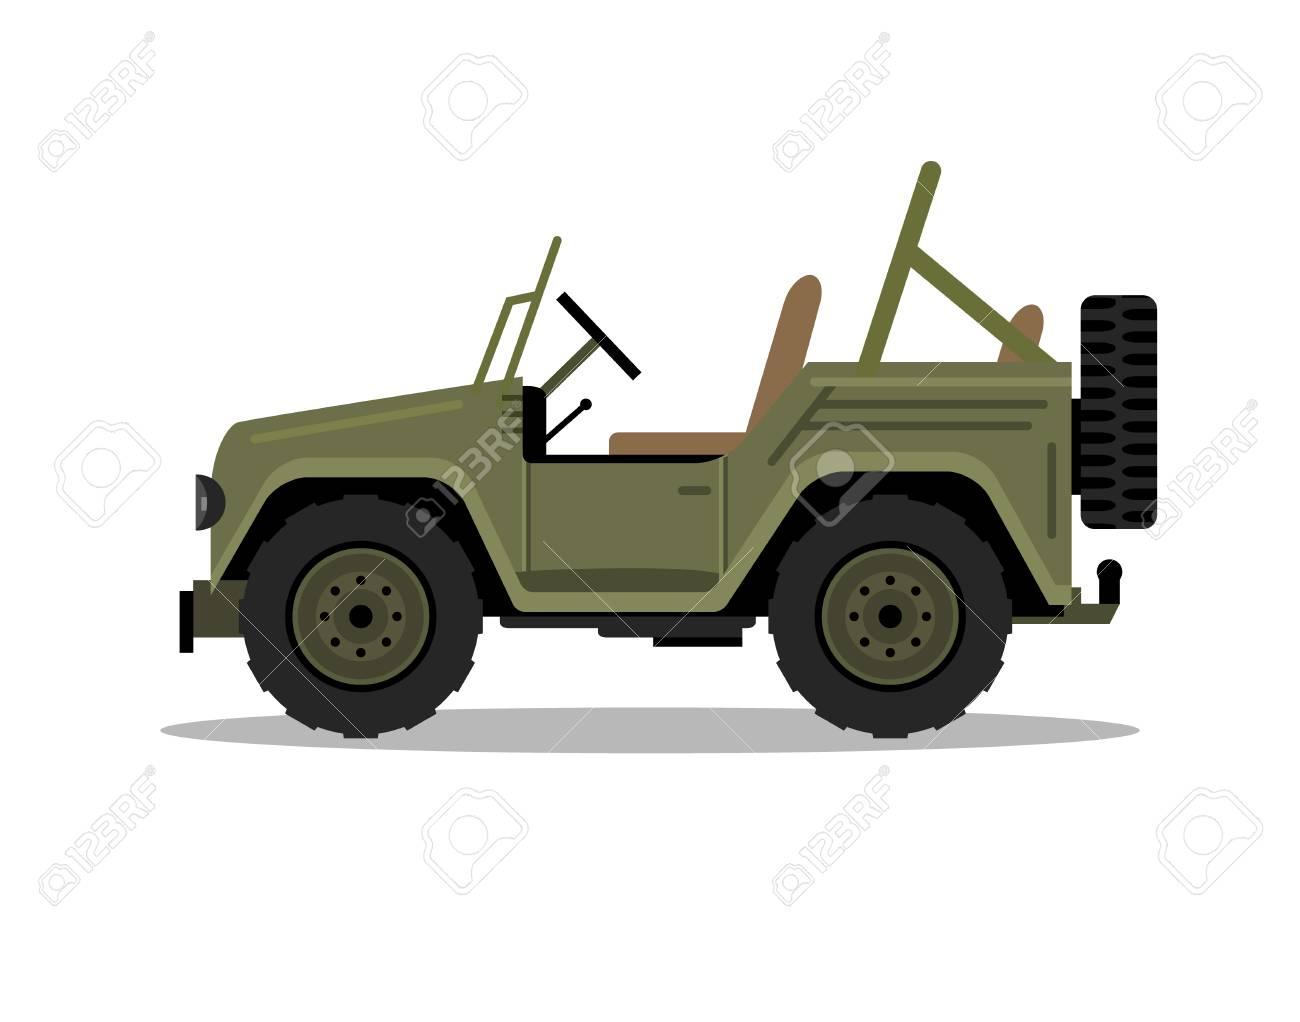 Military army car jeep vehicle. Humvee vector hummer cartoon flat safari oddroad truck illustration - 122353795